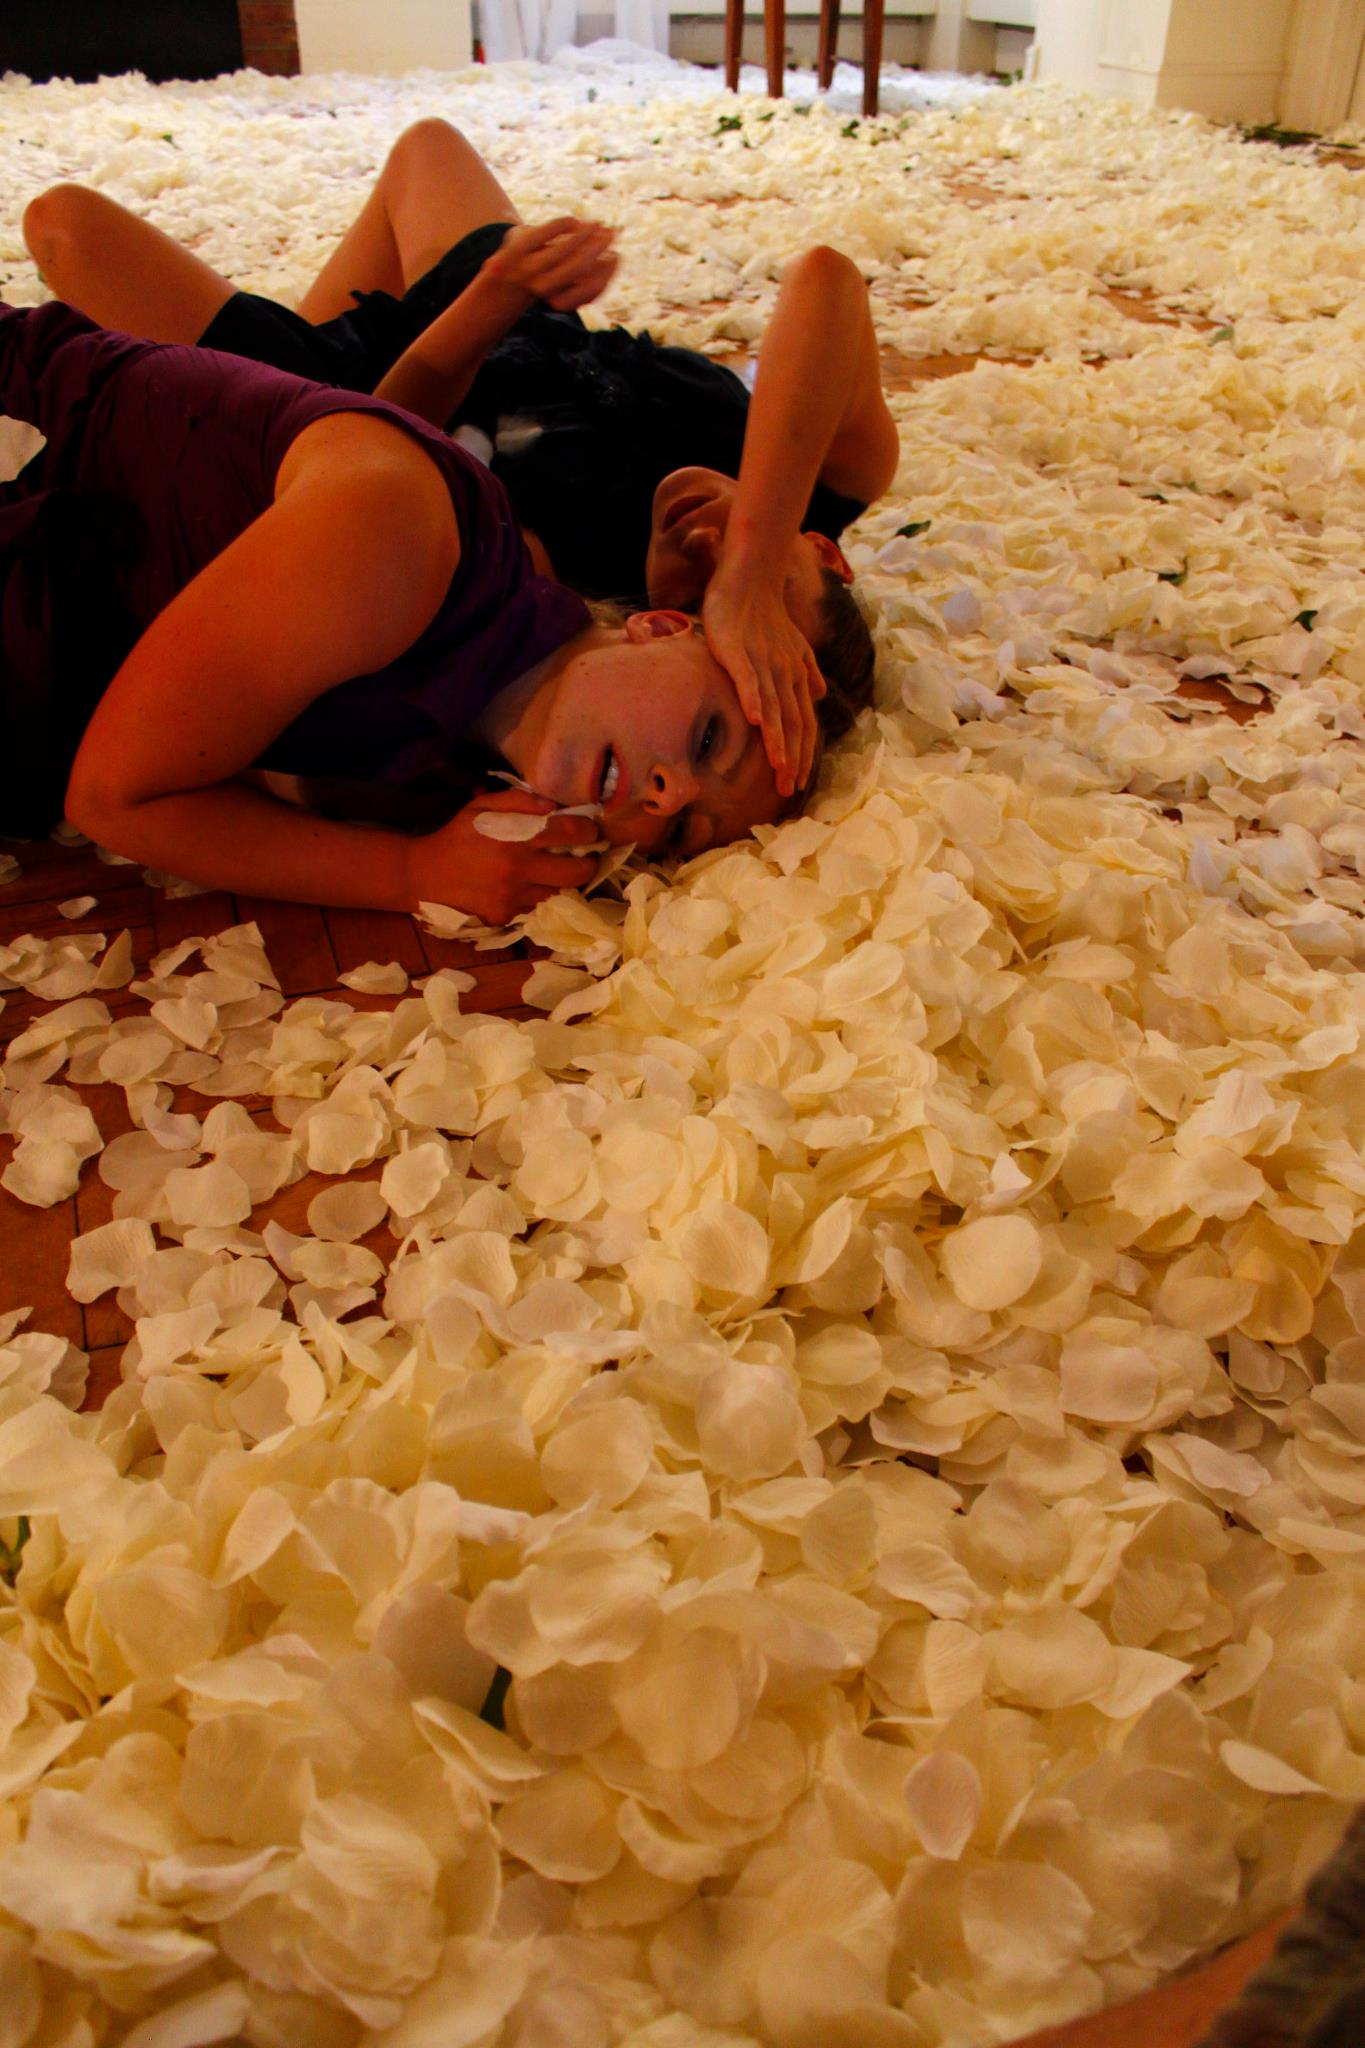 Eyelids 5_Dancers Janice Lancaster Larsen & Lauren Muraski, photographer Wong Chun Bong, ADF 2011.jpg